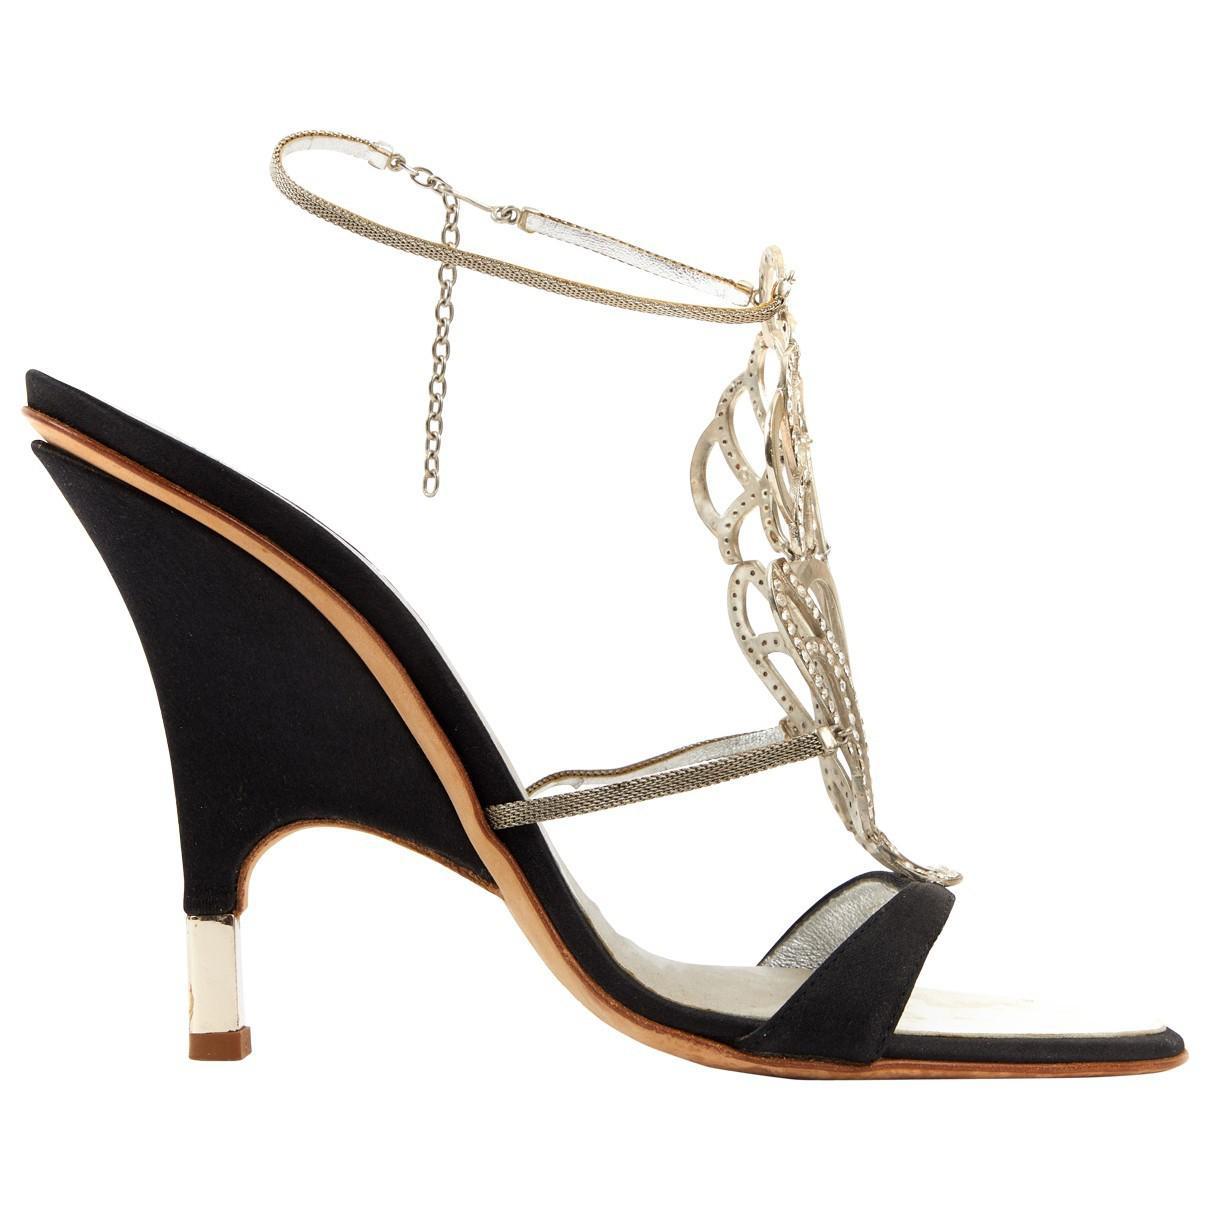 Pre-owned - Cloth sandals Giuseppe Zanotti BCcKBzz